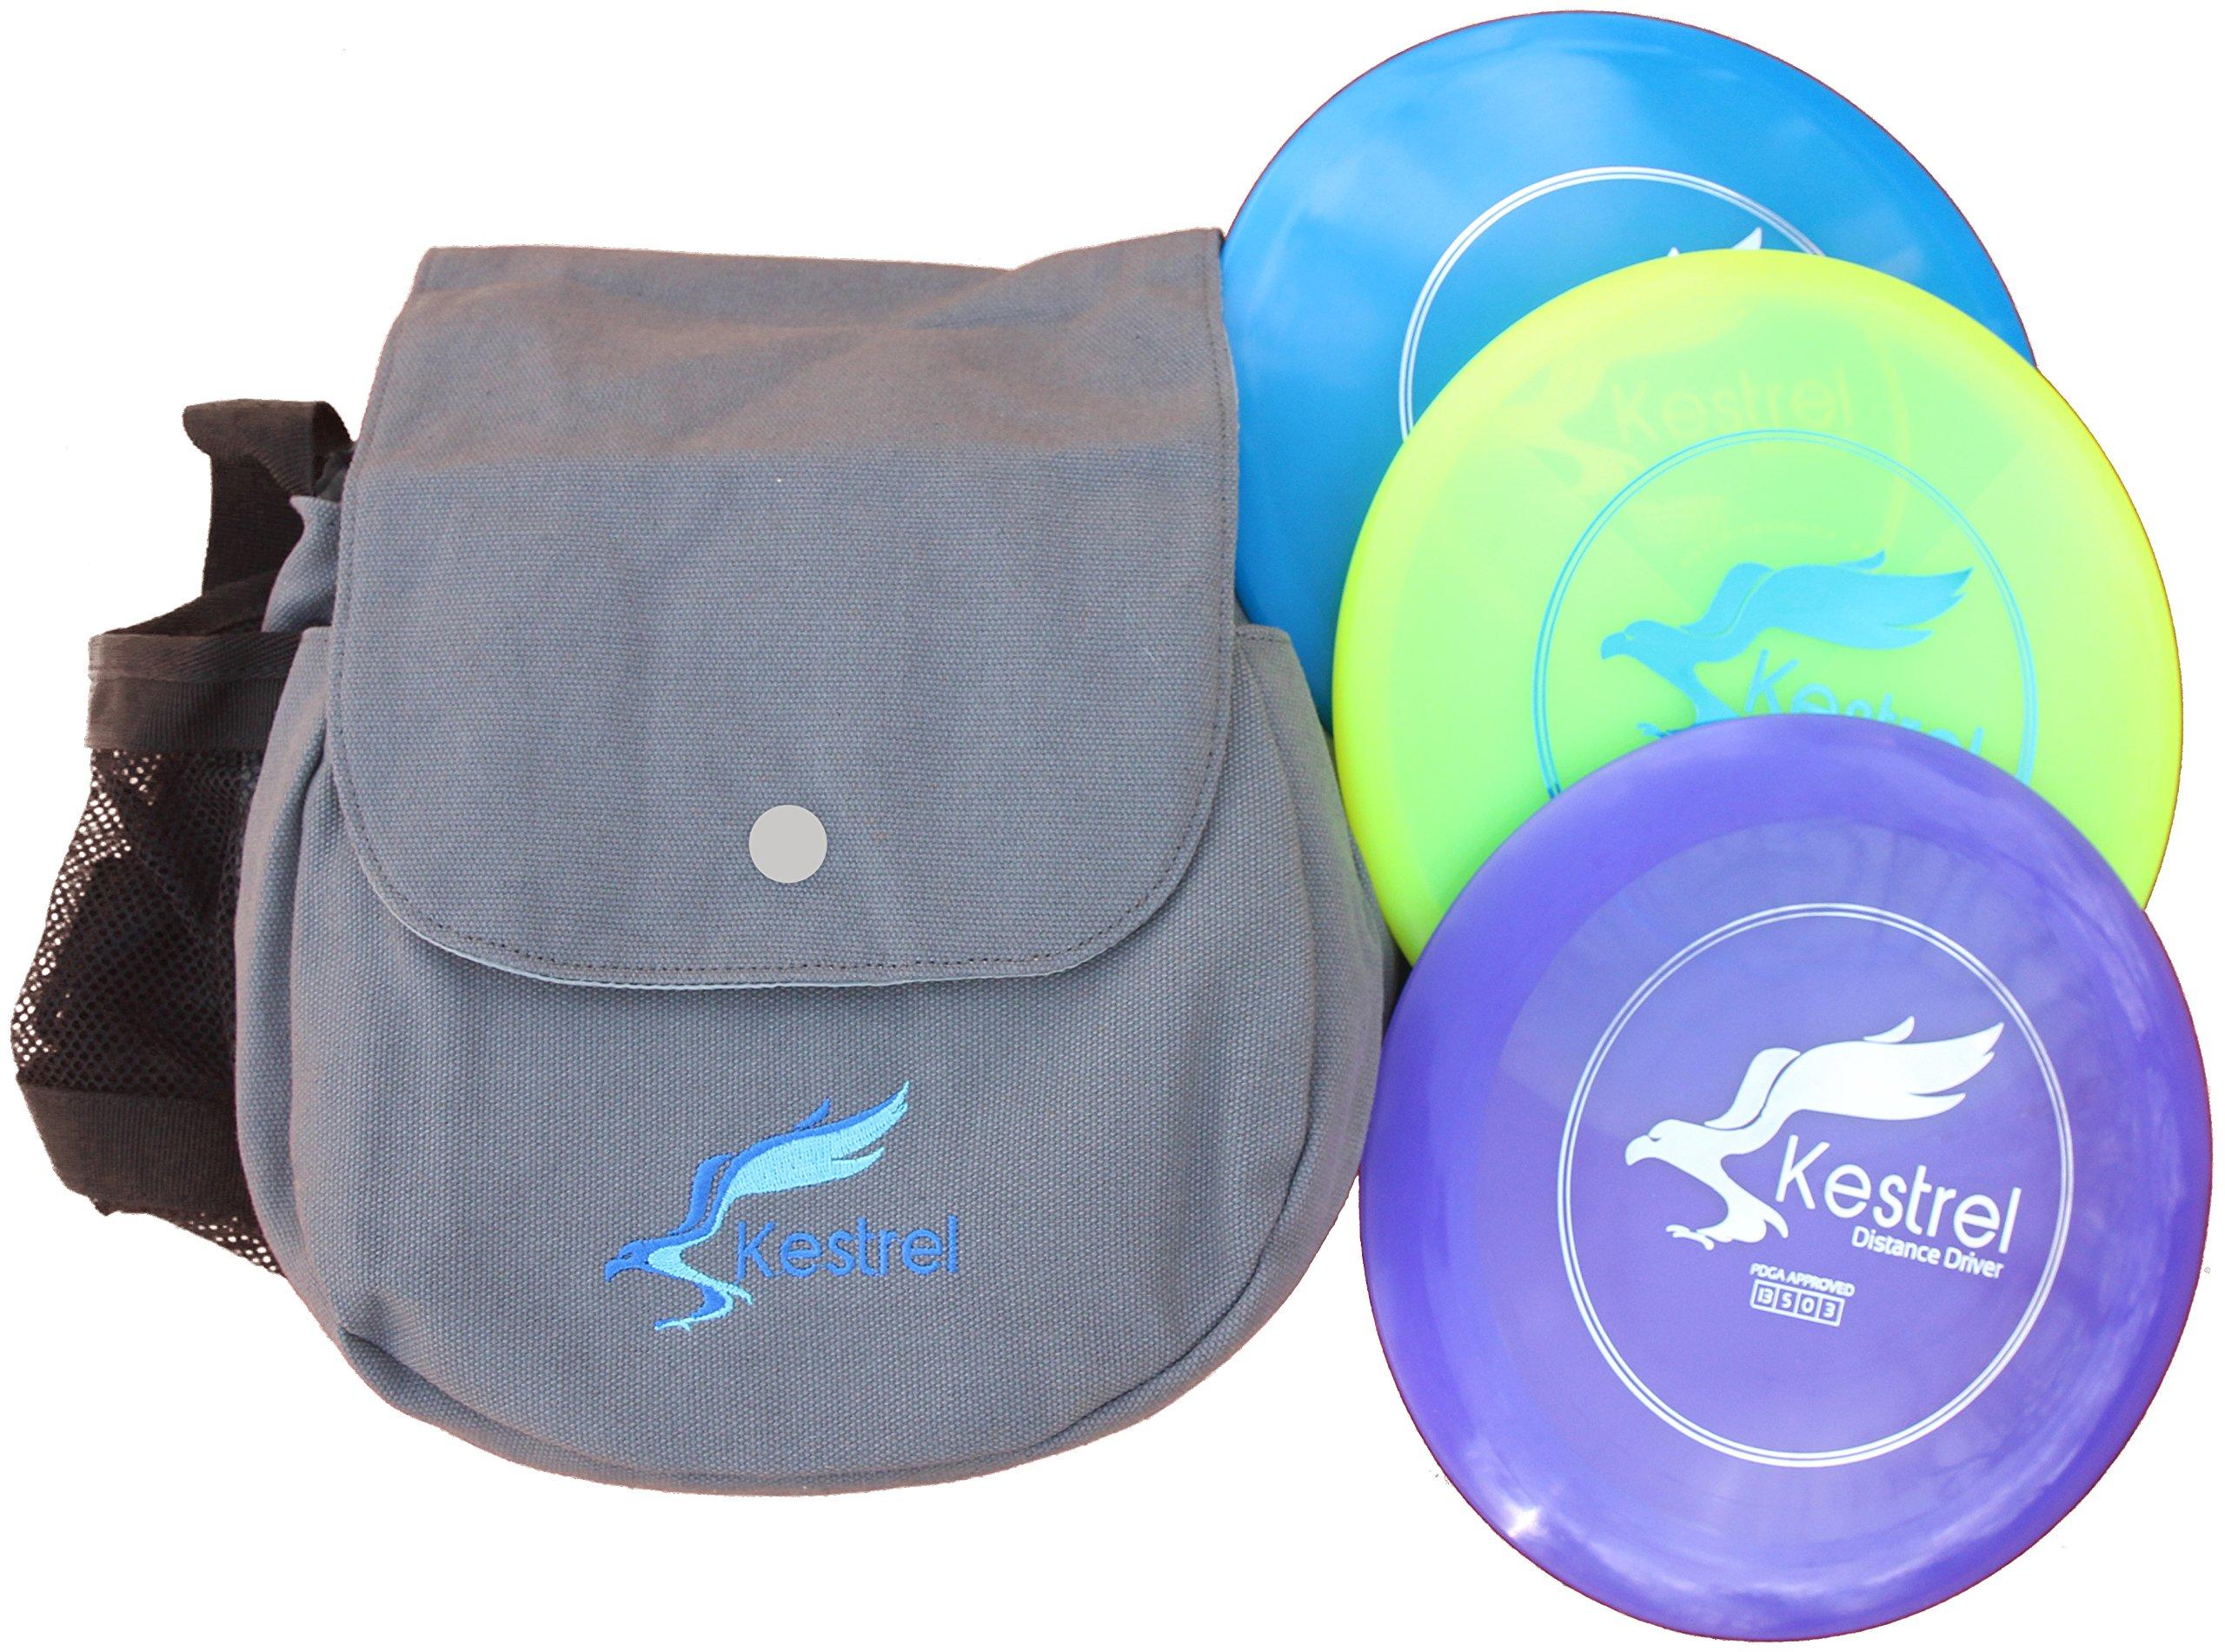 Kestrel Discs Golf Pro Set | 3 Disc Pro Pack Bundle + Bag | Disc Golf Set | Includes Distance Driver, Mid-Range and Putter | Small Disc Golf Bag (Gray) by Kestrel Discs